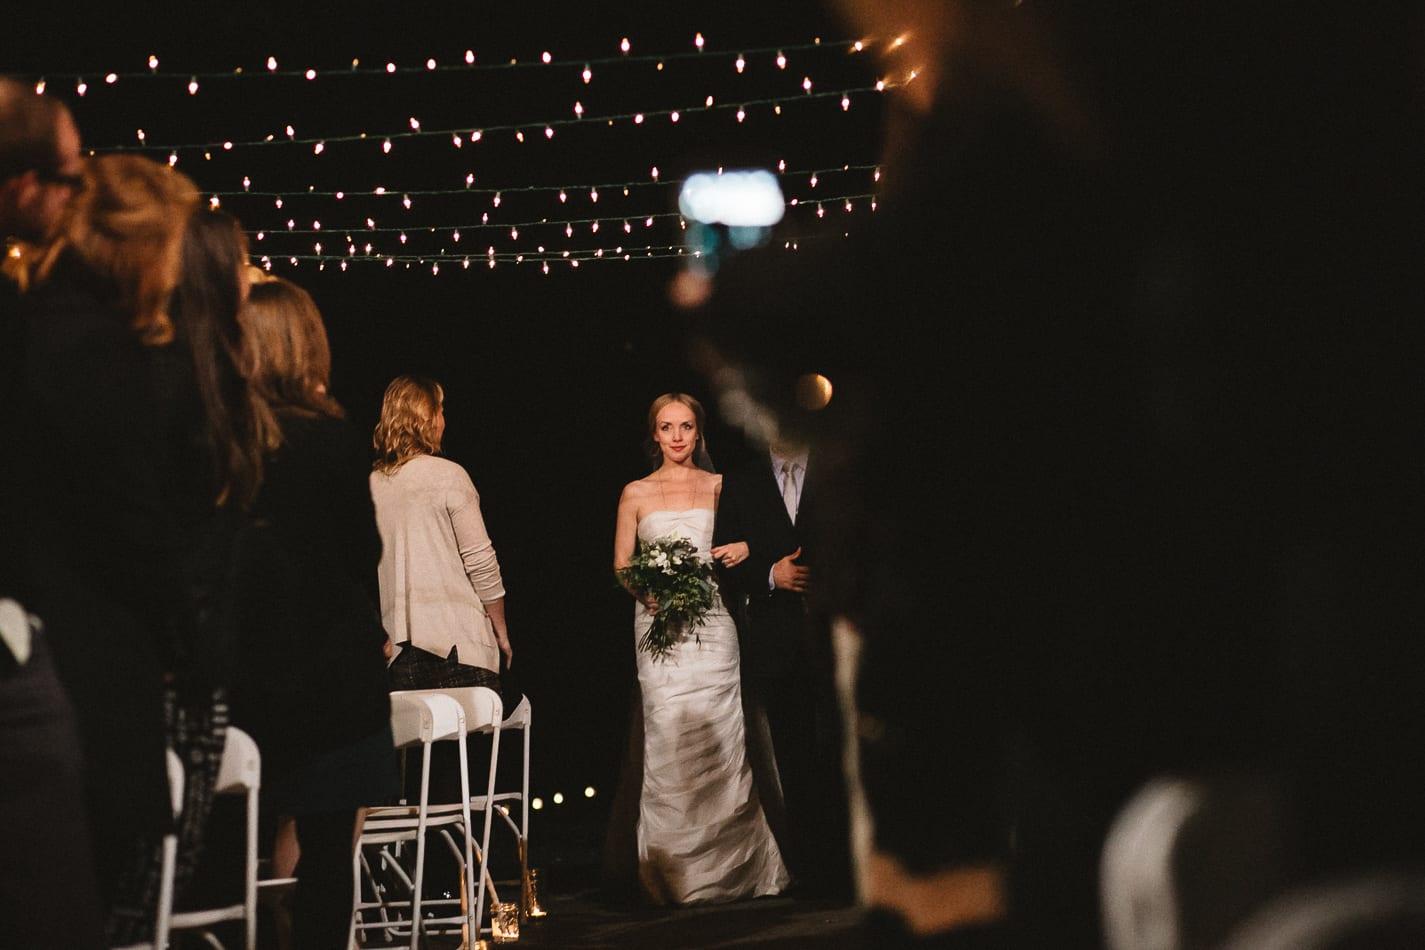 lake-redding-park-diesel-horse-bridge-view202-california-wedding-photographer-15